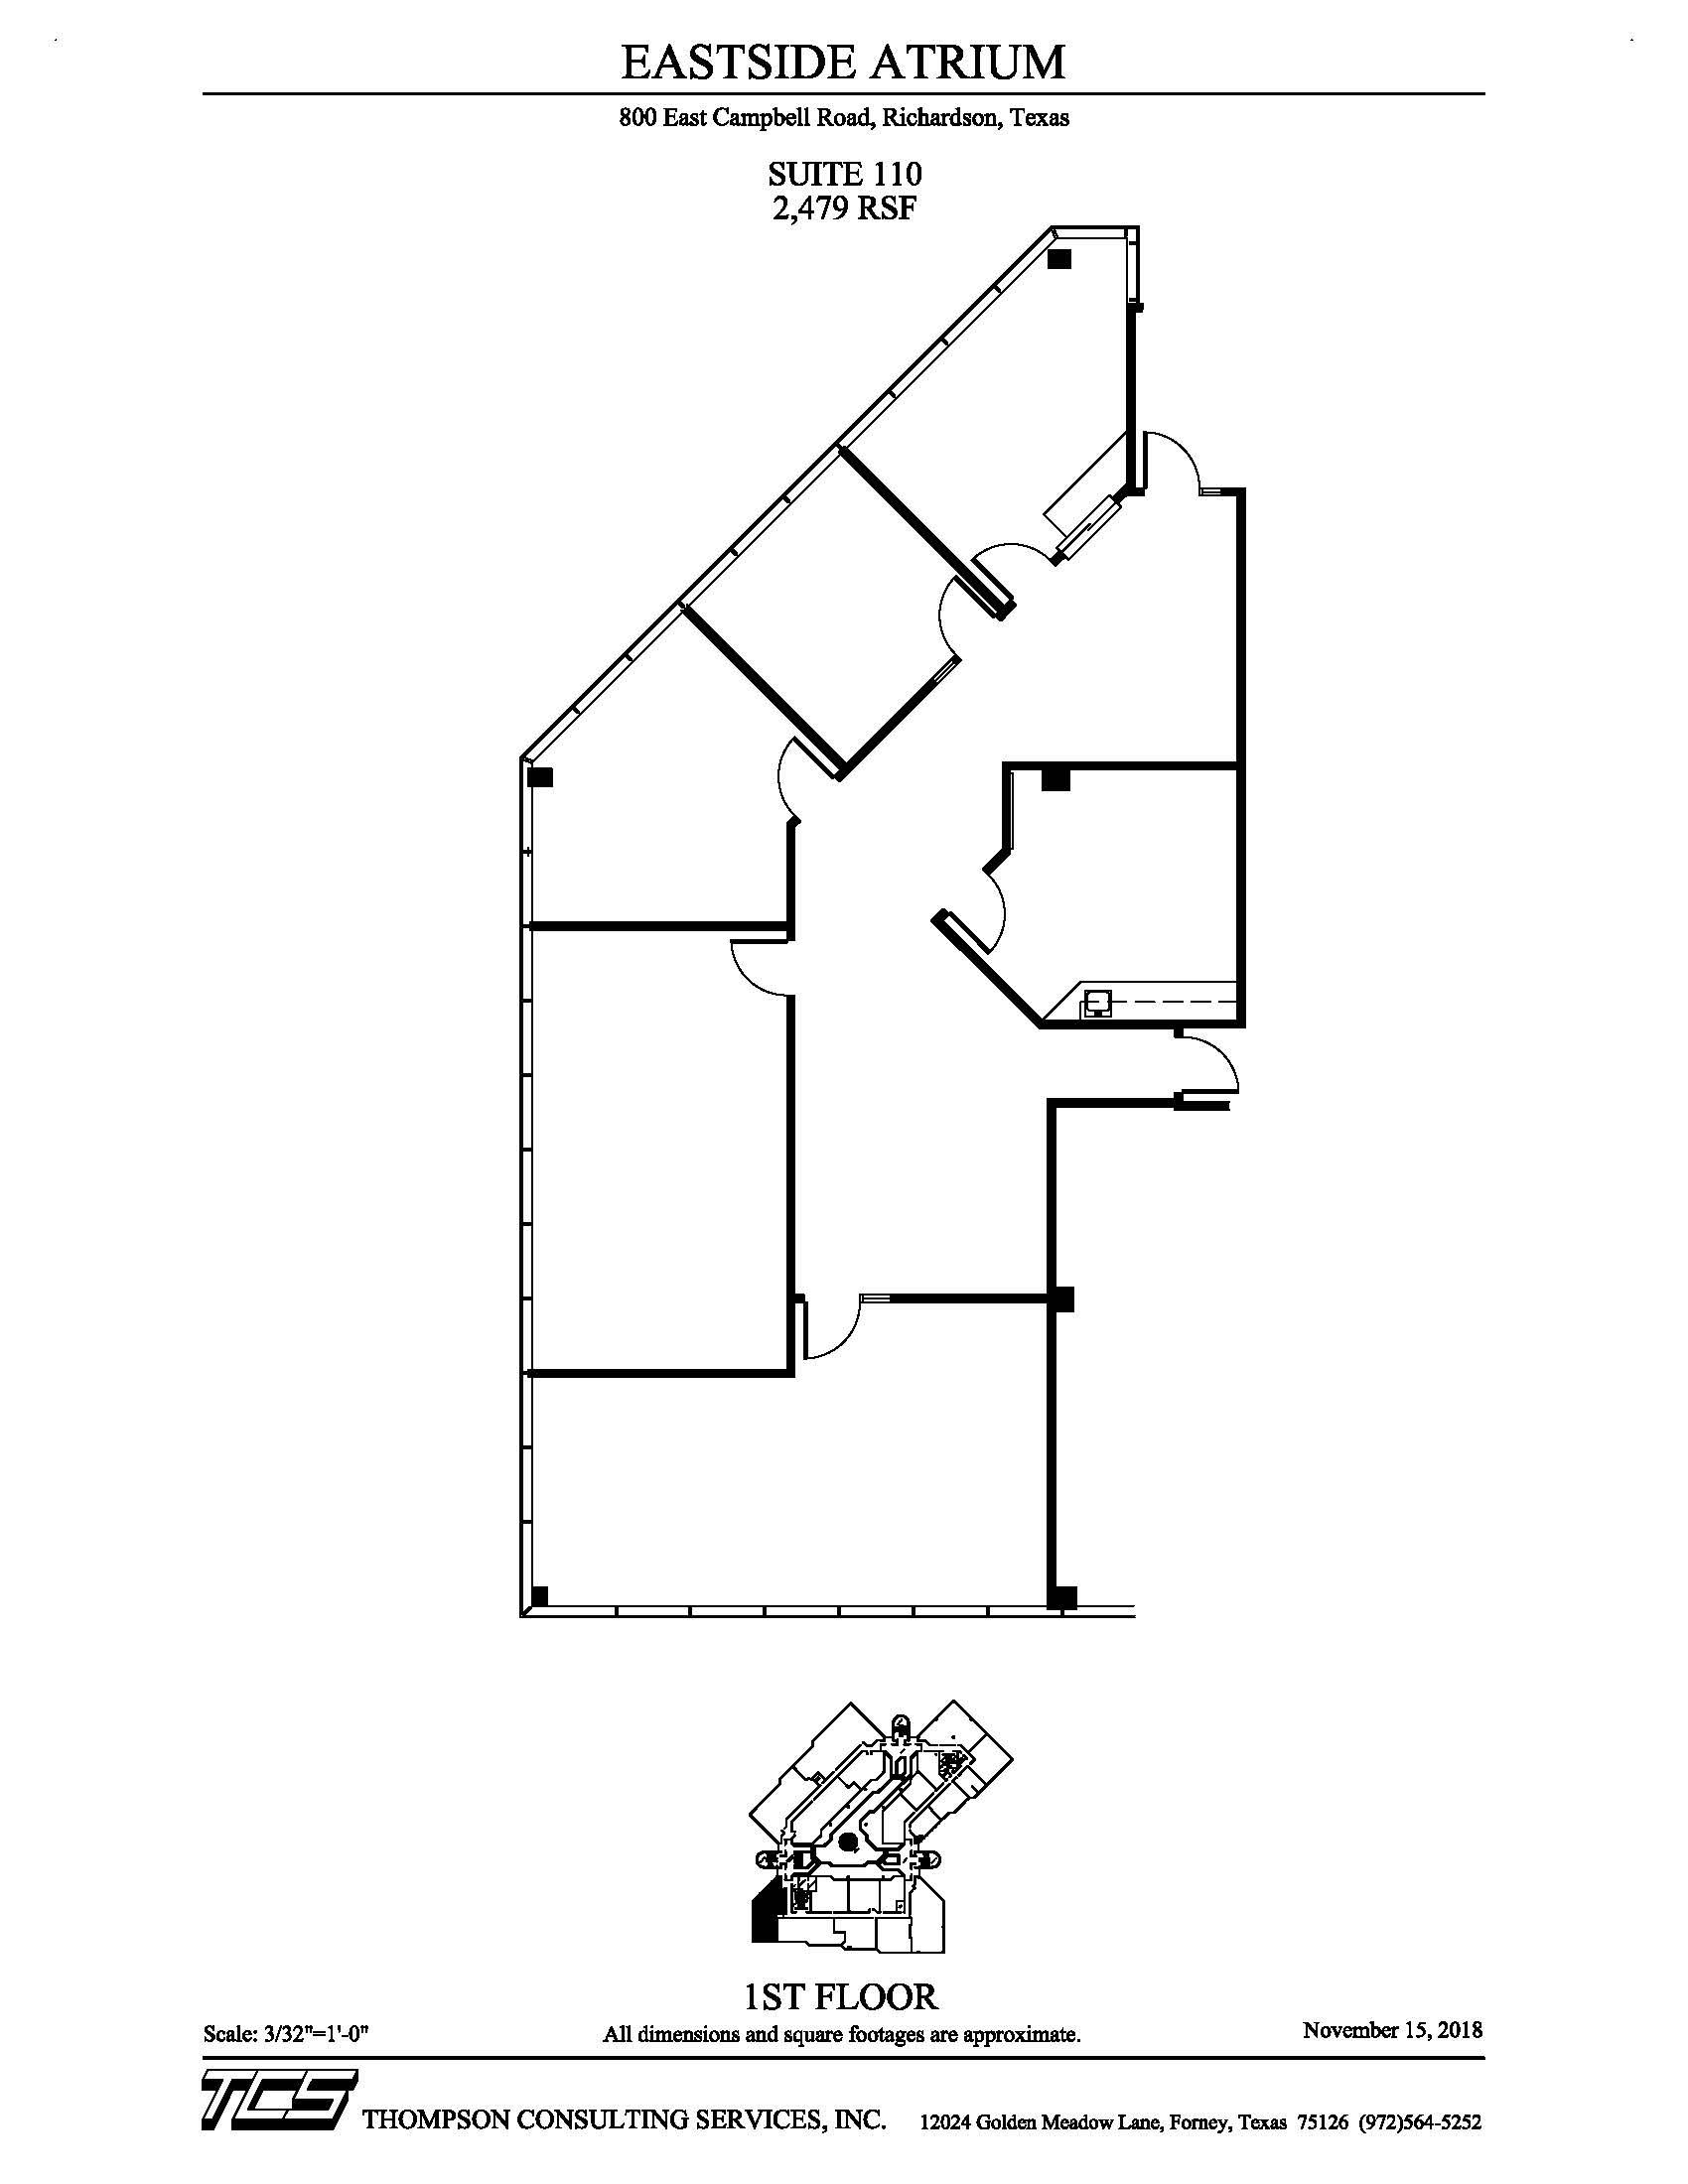 Eastside Atrium - Suite 110 - Marketing Plan.jpg